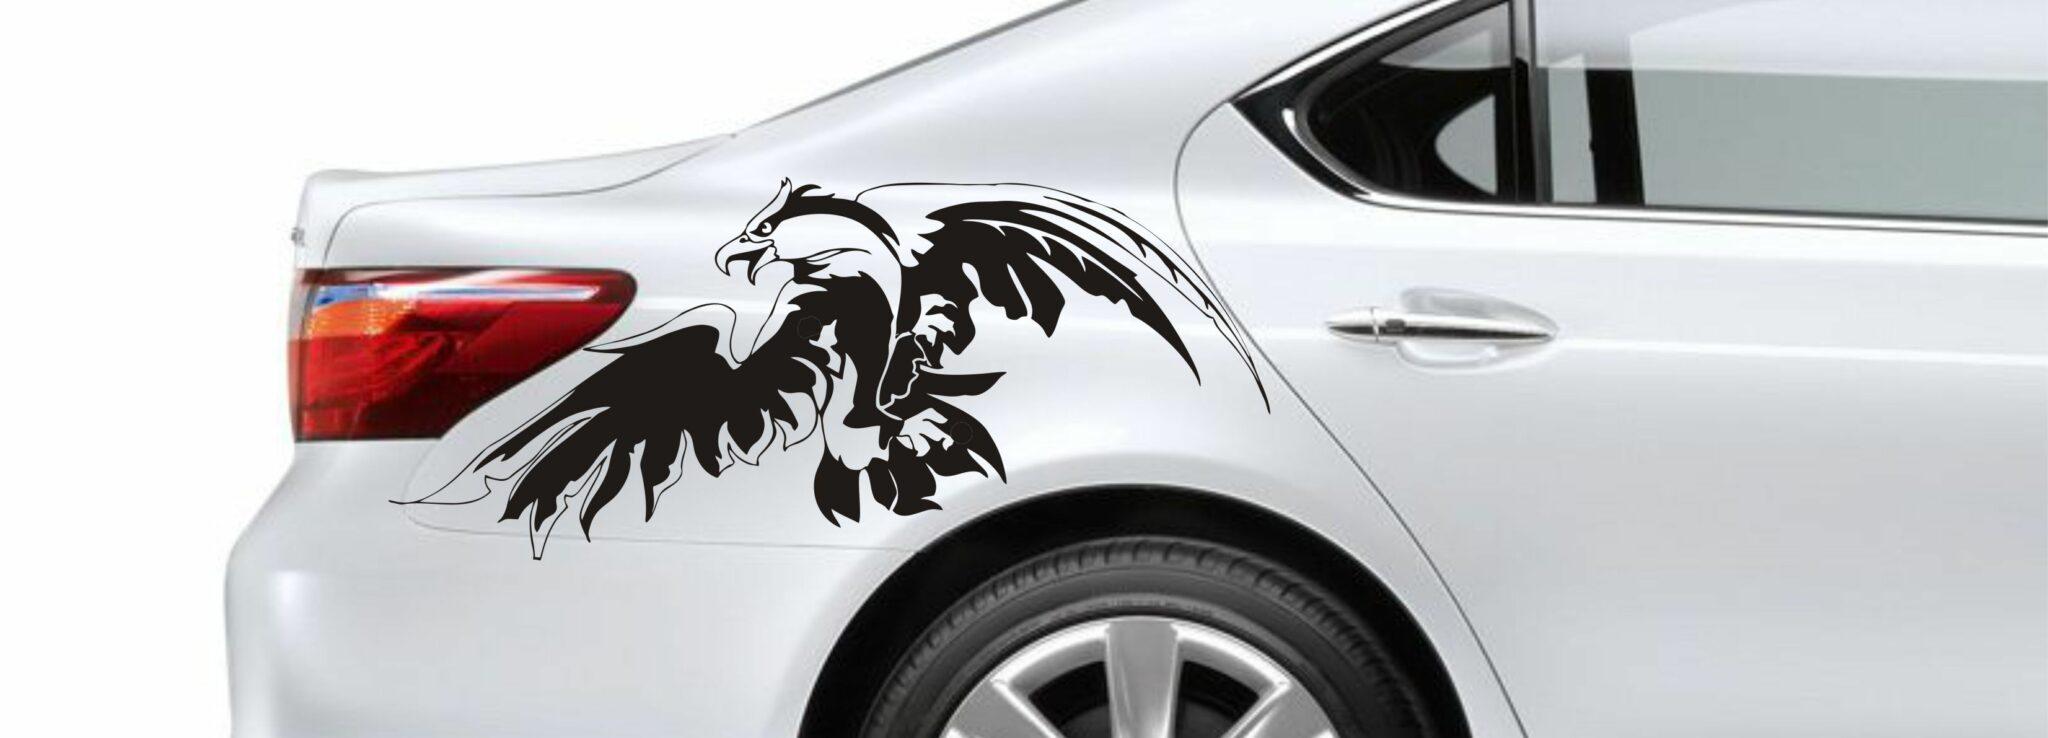 Черно белые наклейки на авто